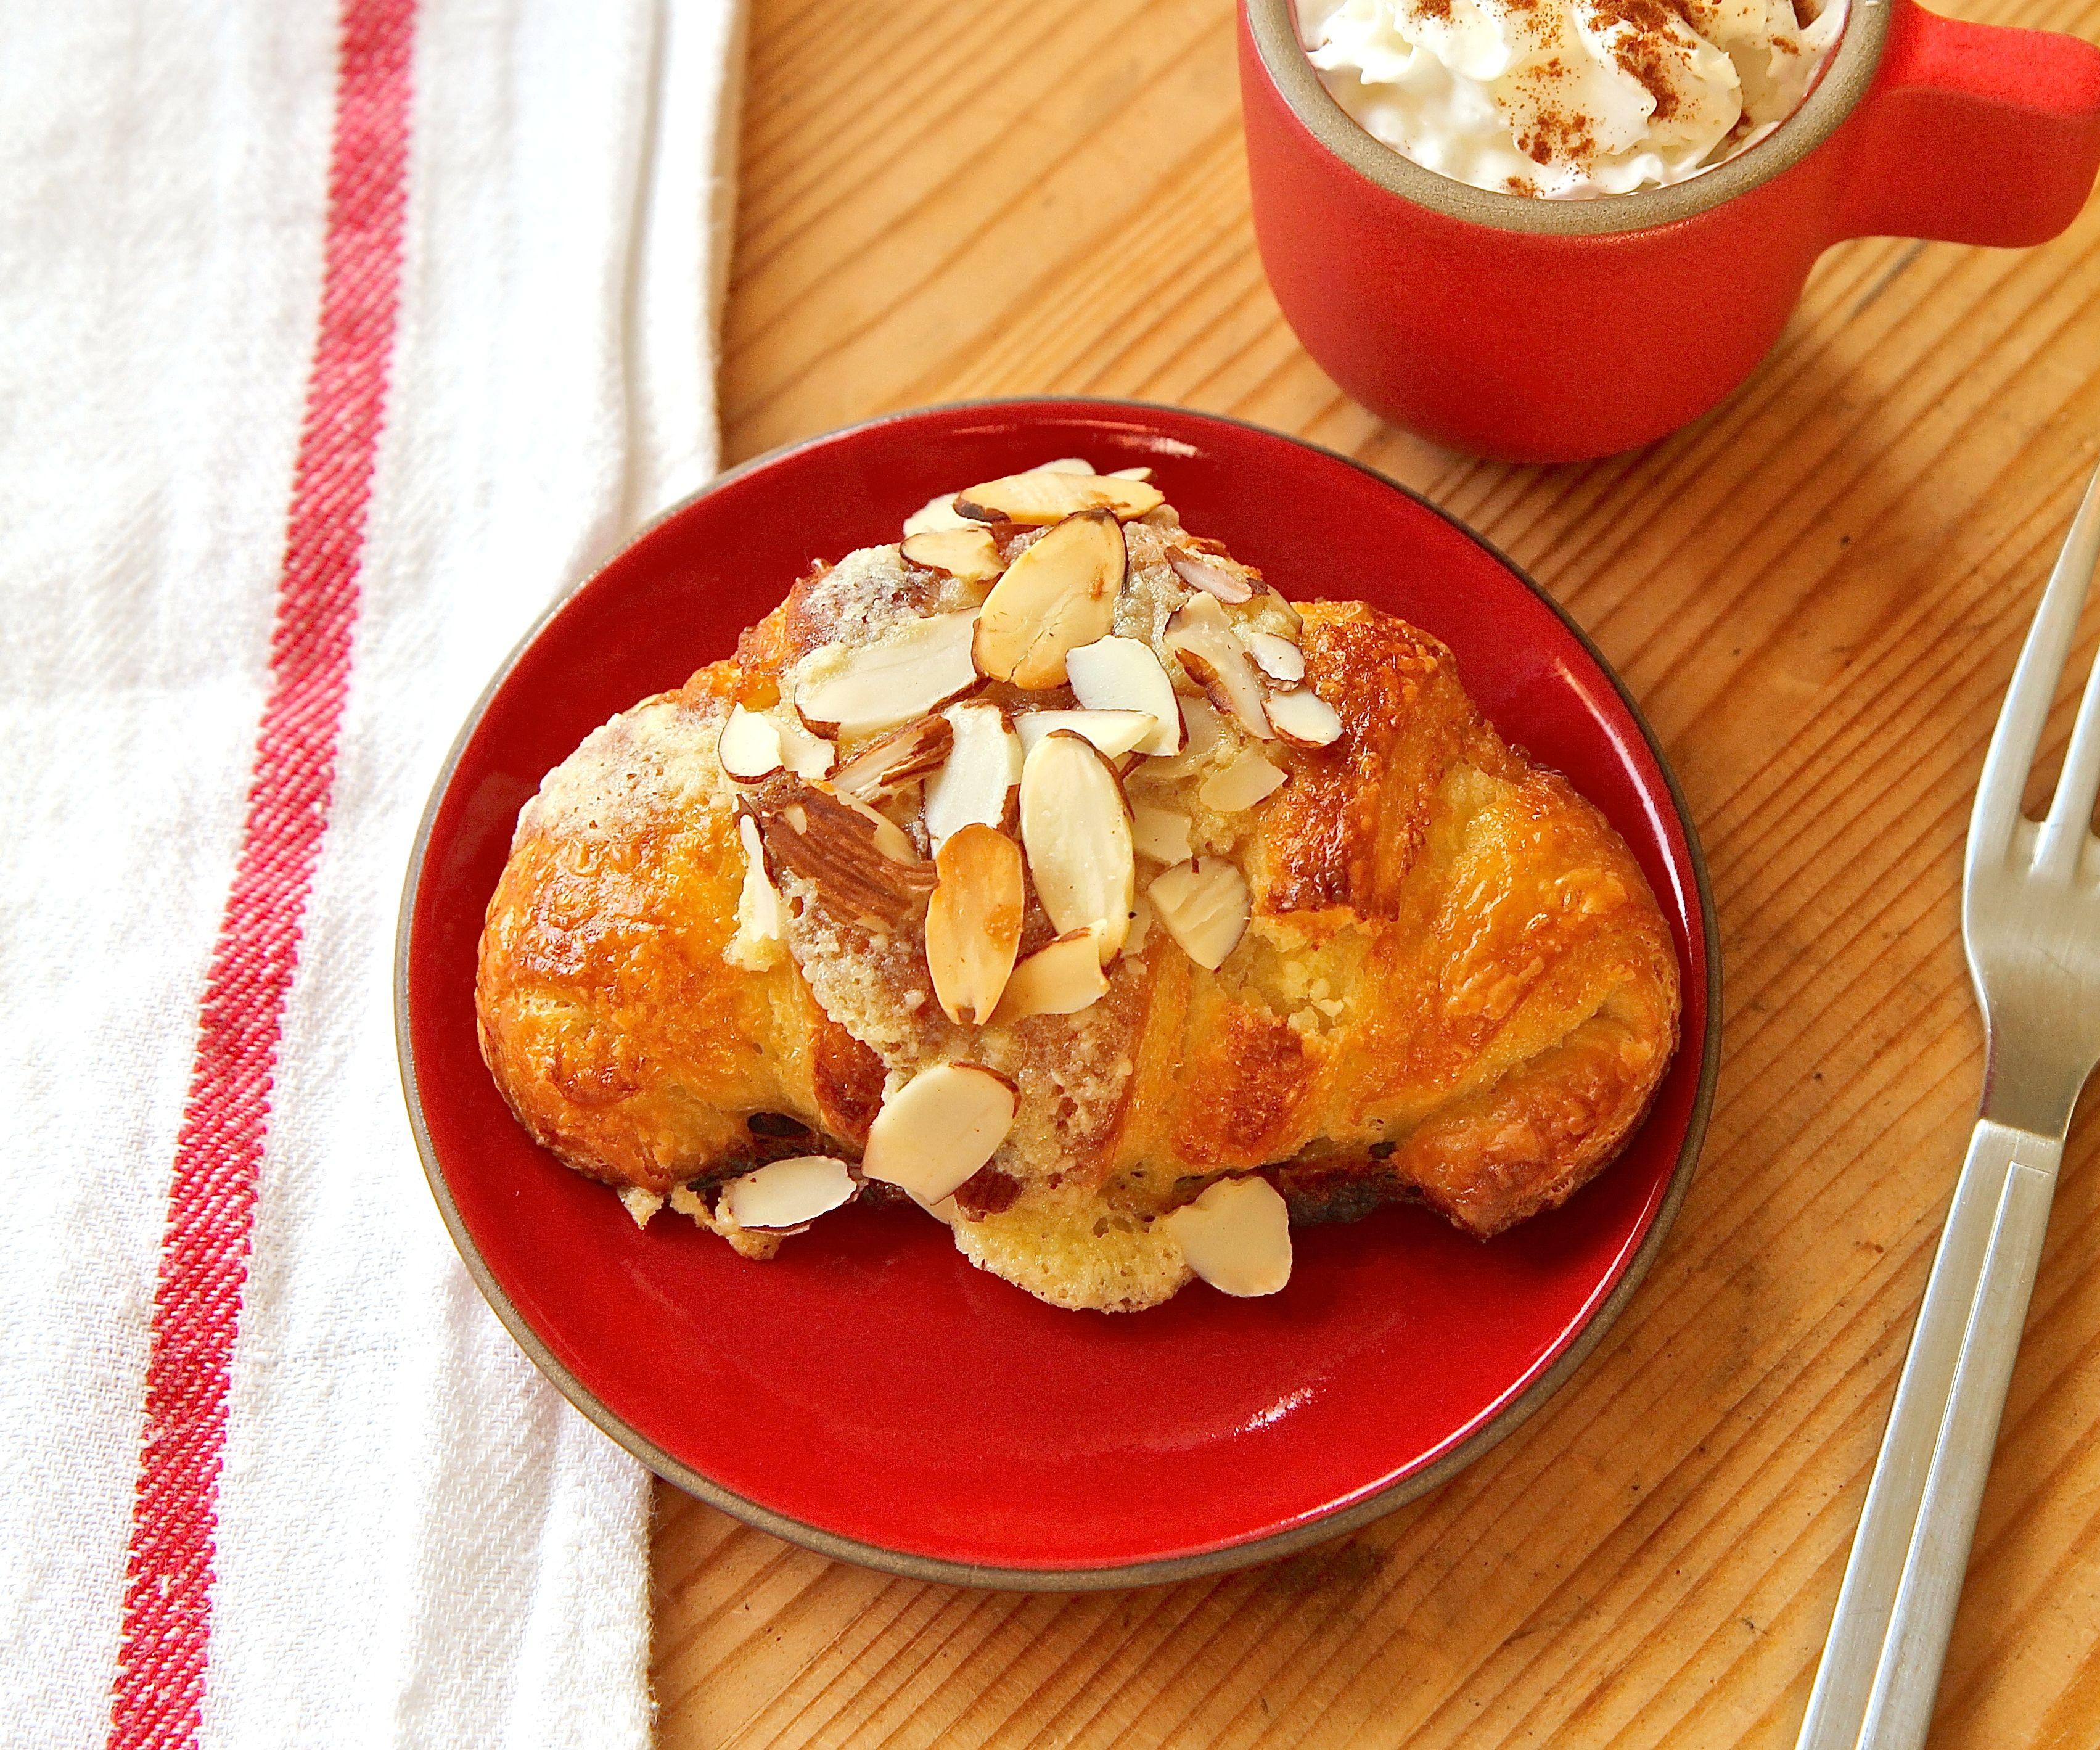 Homemade Almond Croissants